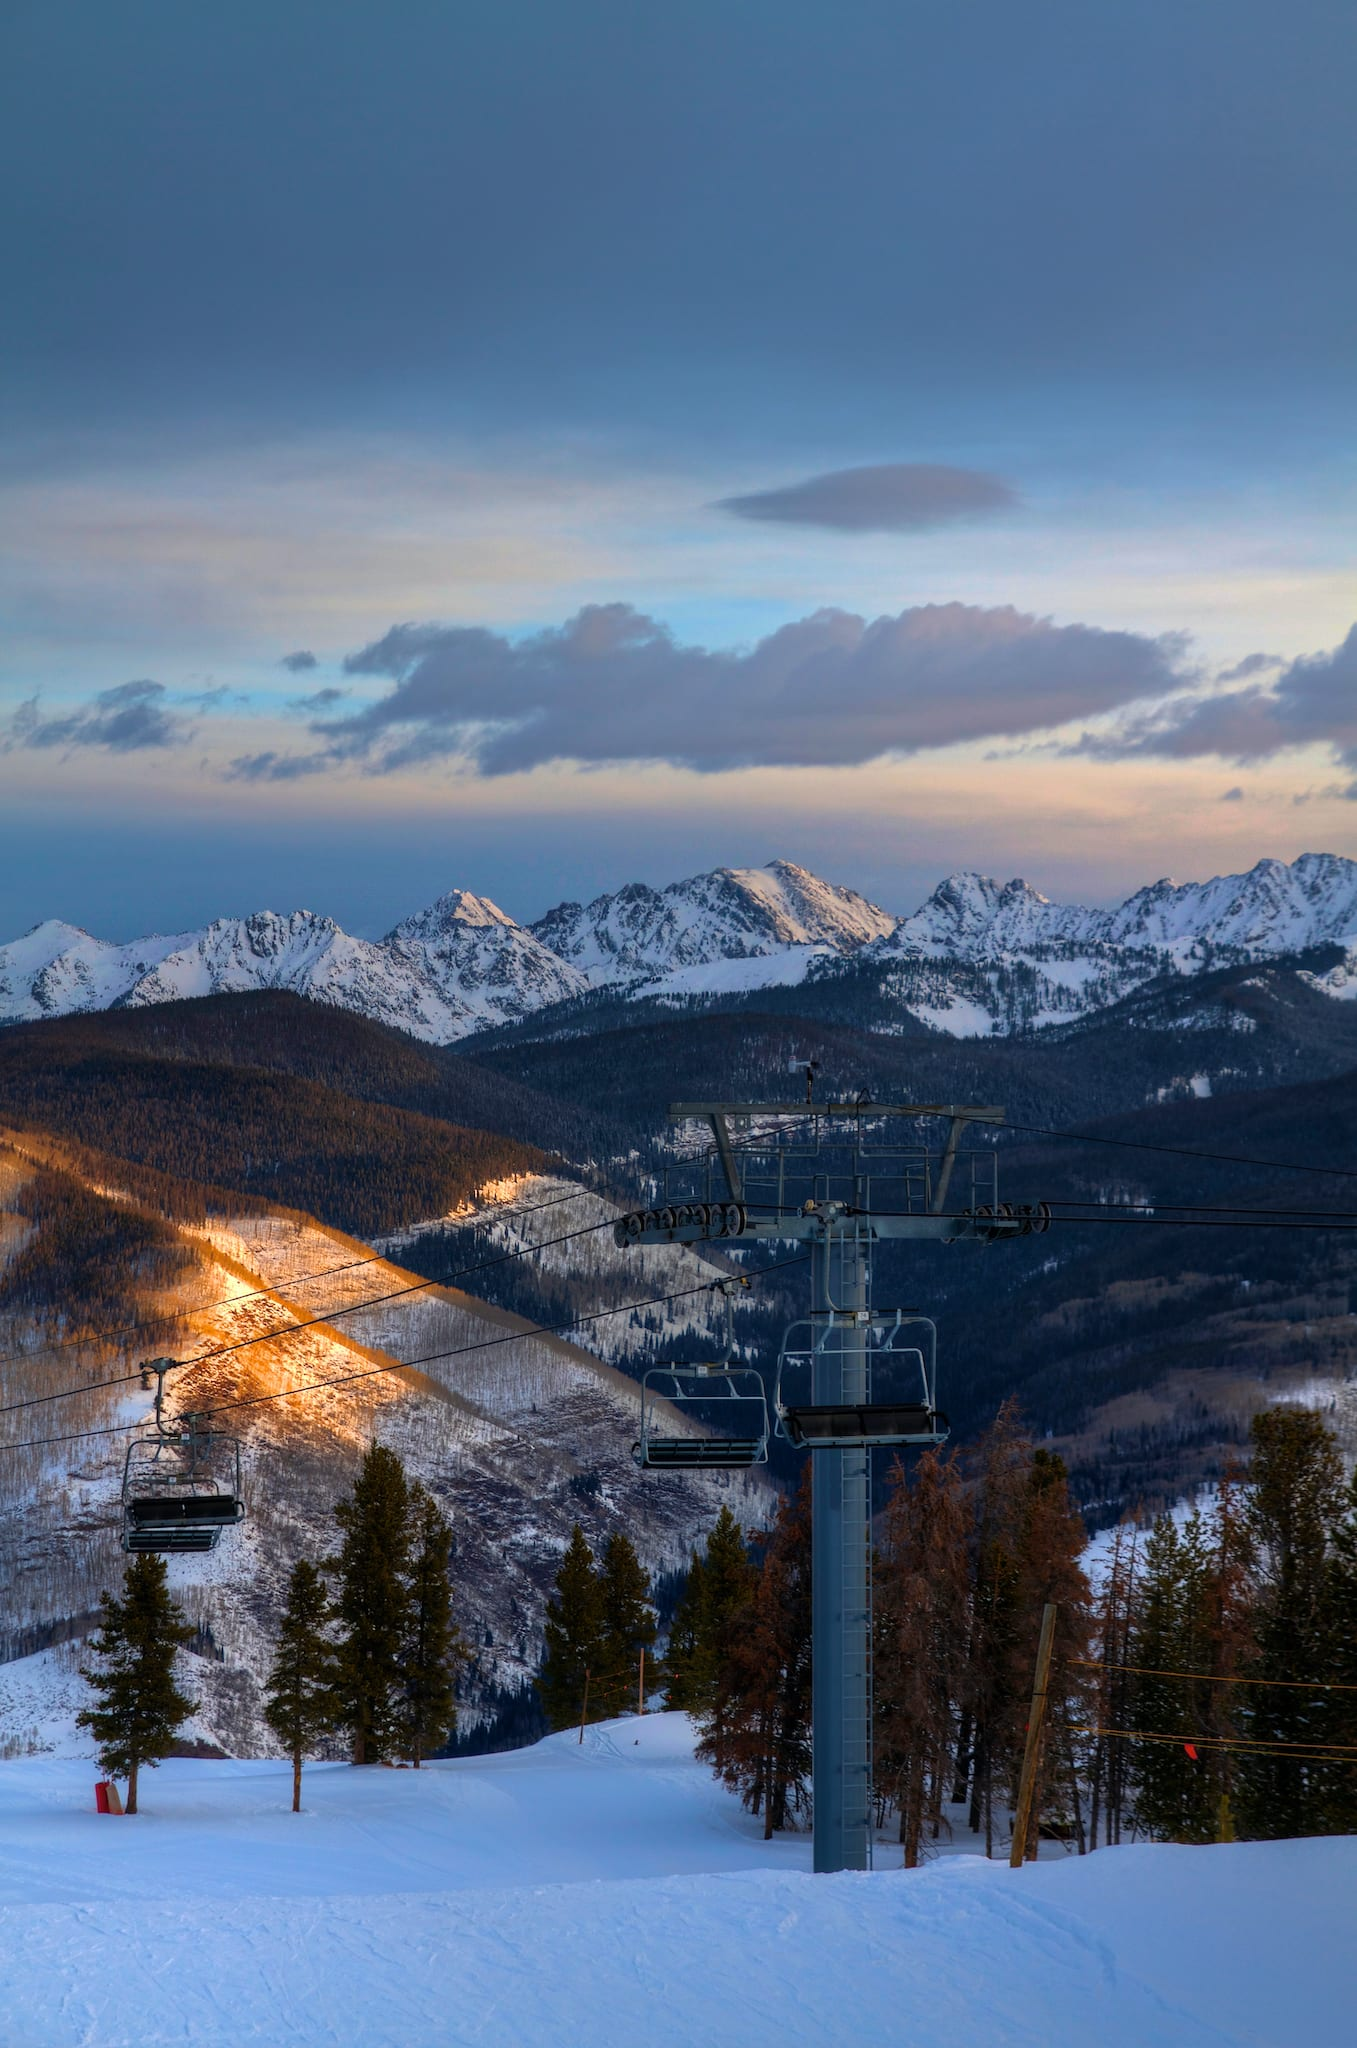 Vail Ski Resort Gore Mountain Range Sunrise